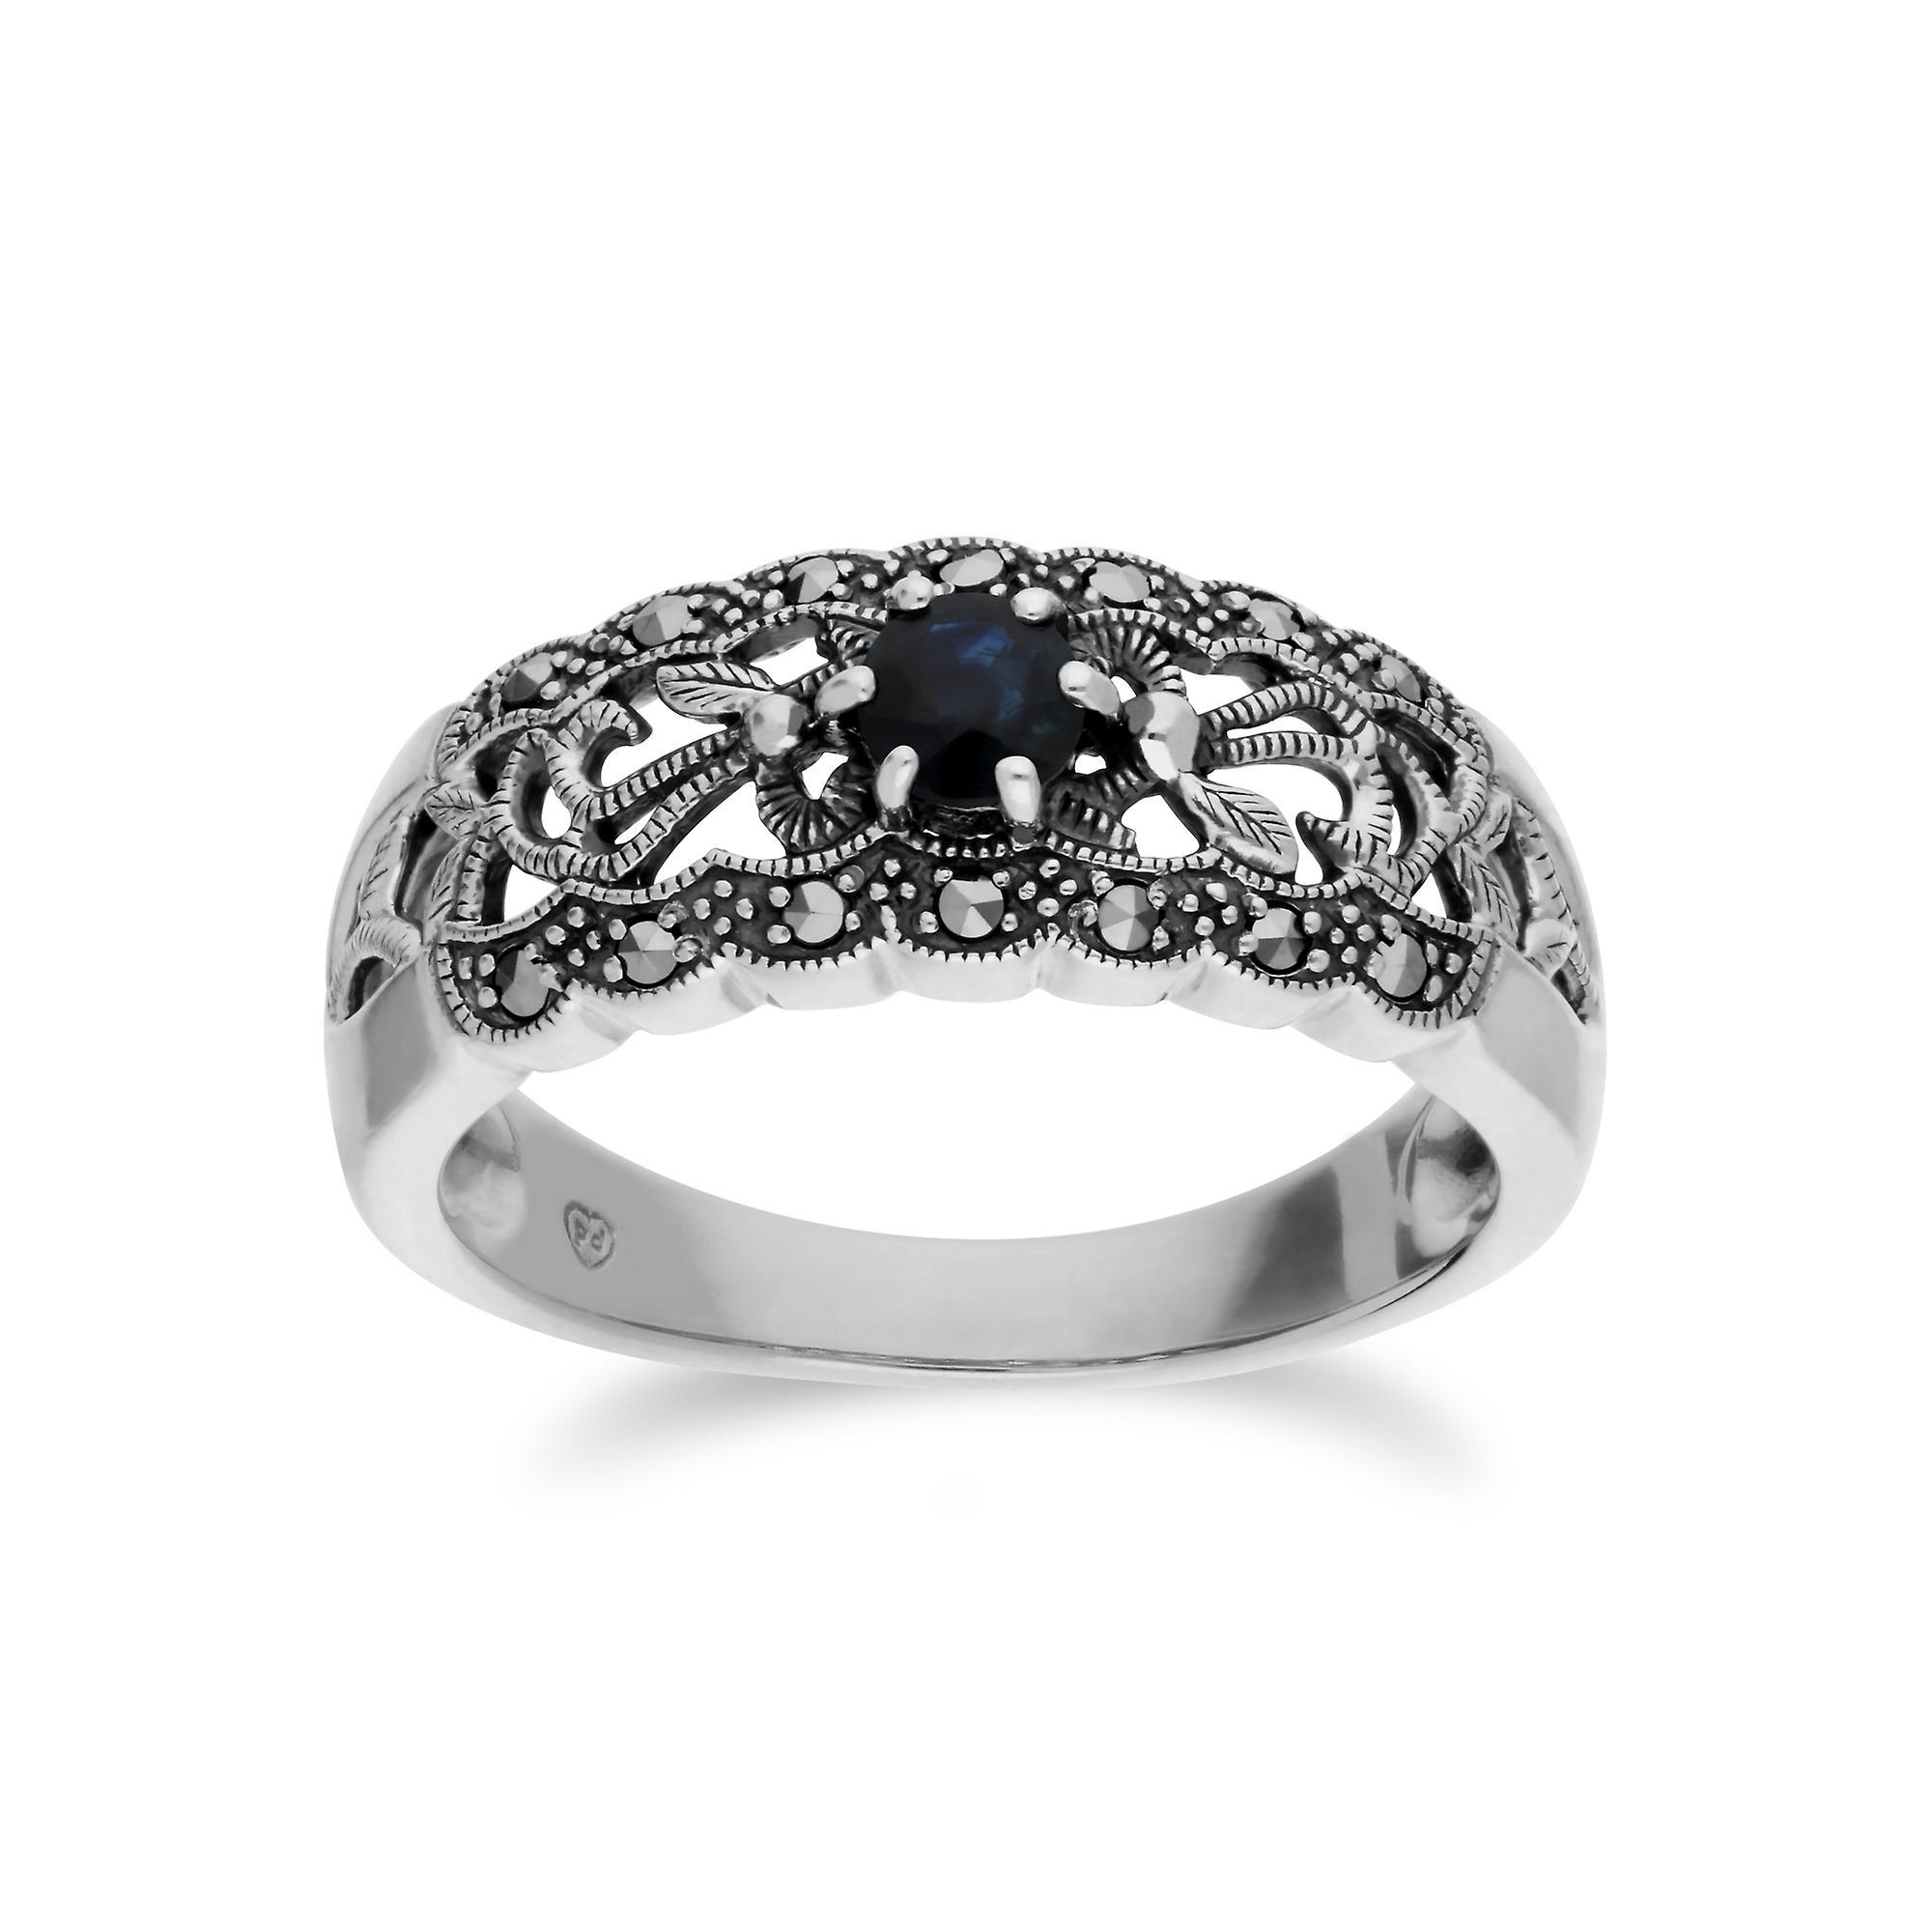 Gemondo Sterling Silver Sapphire & Marcasite Art Nouveau Ring